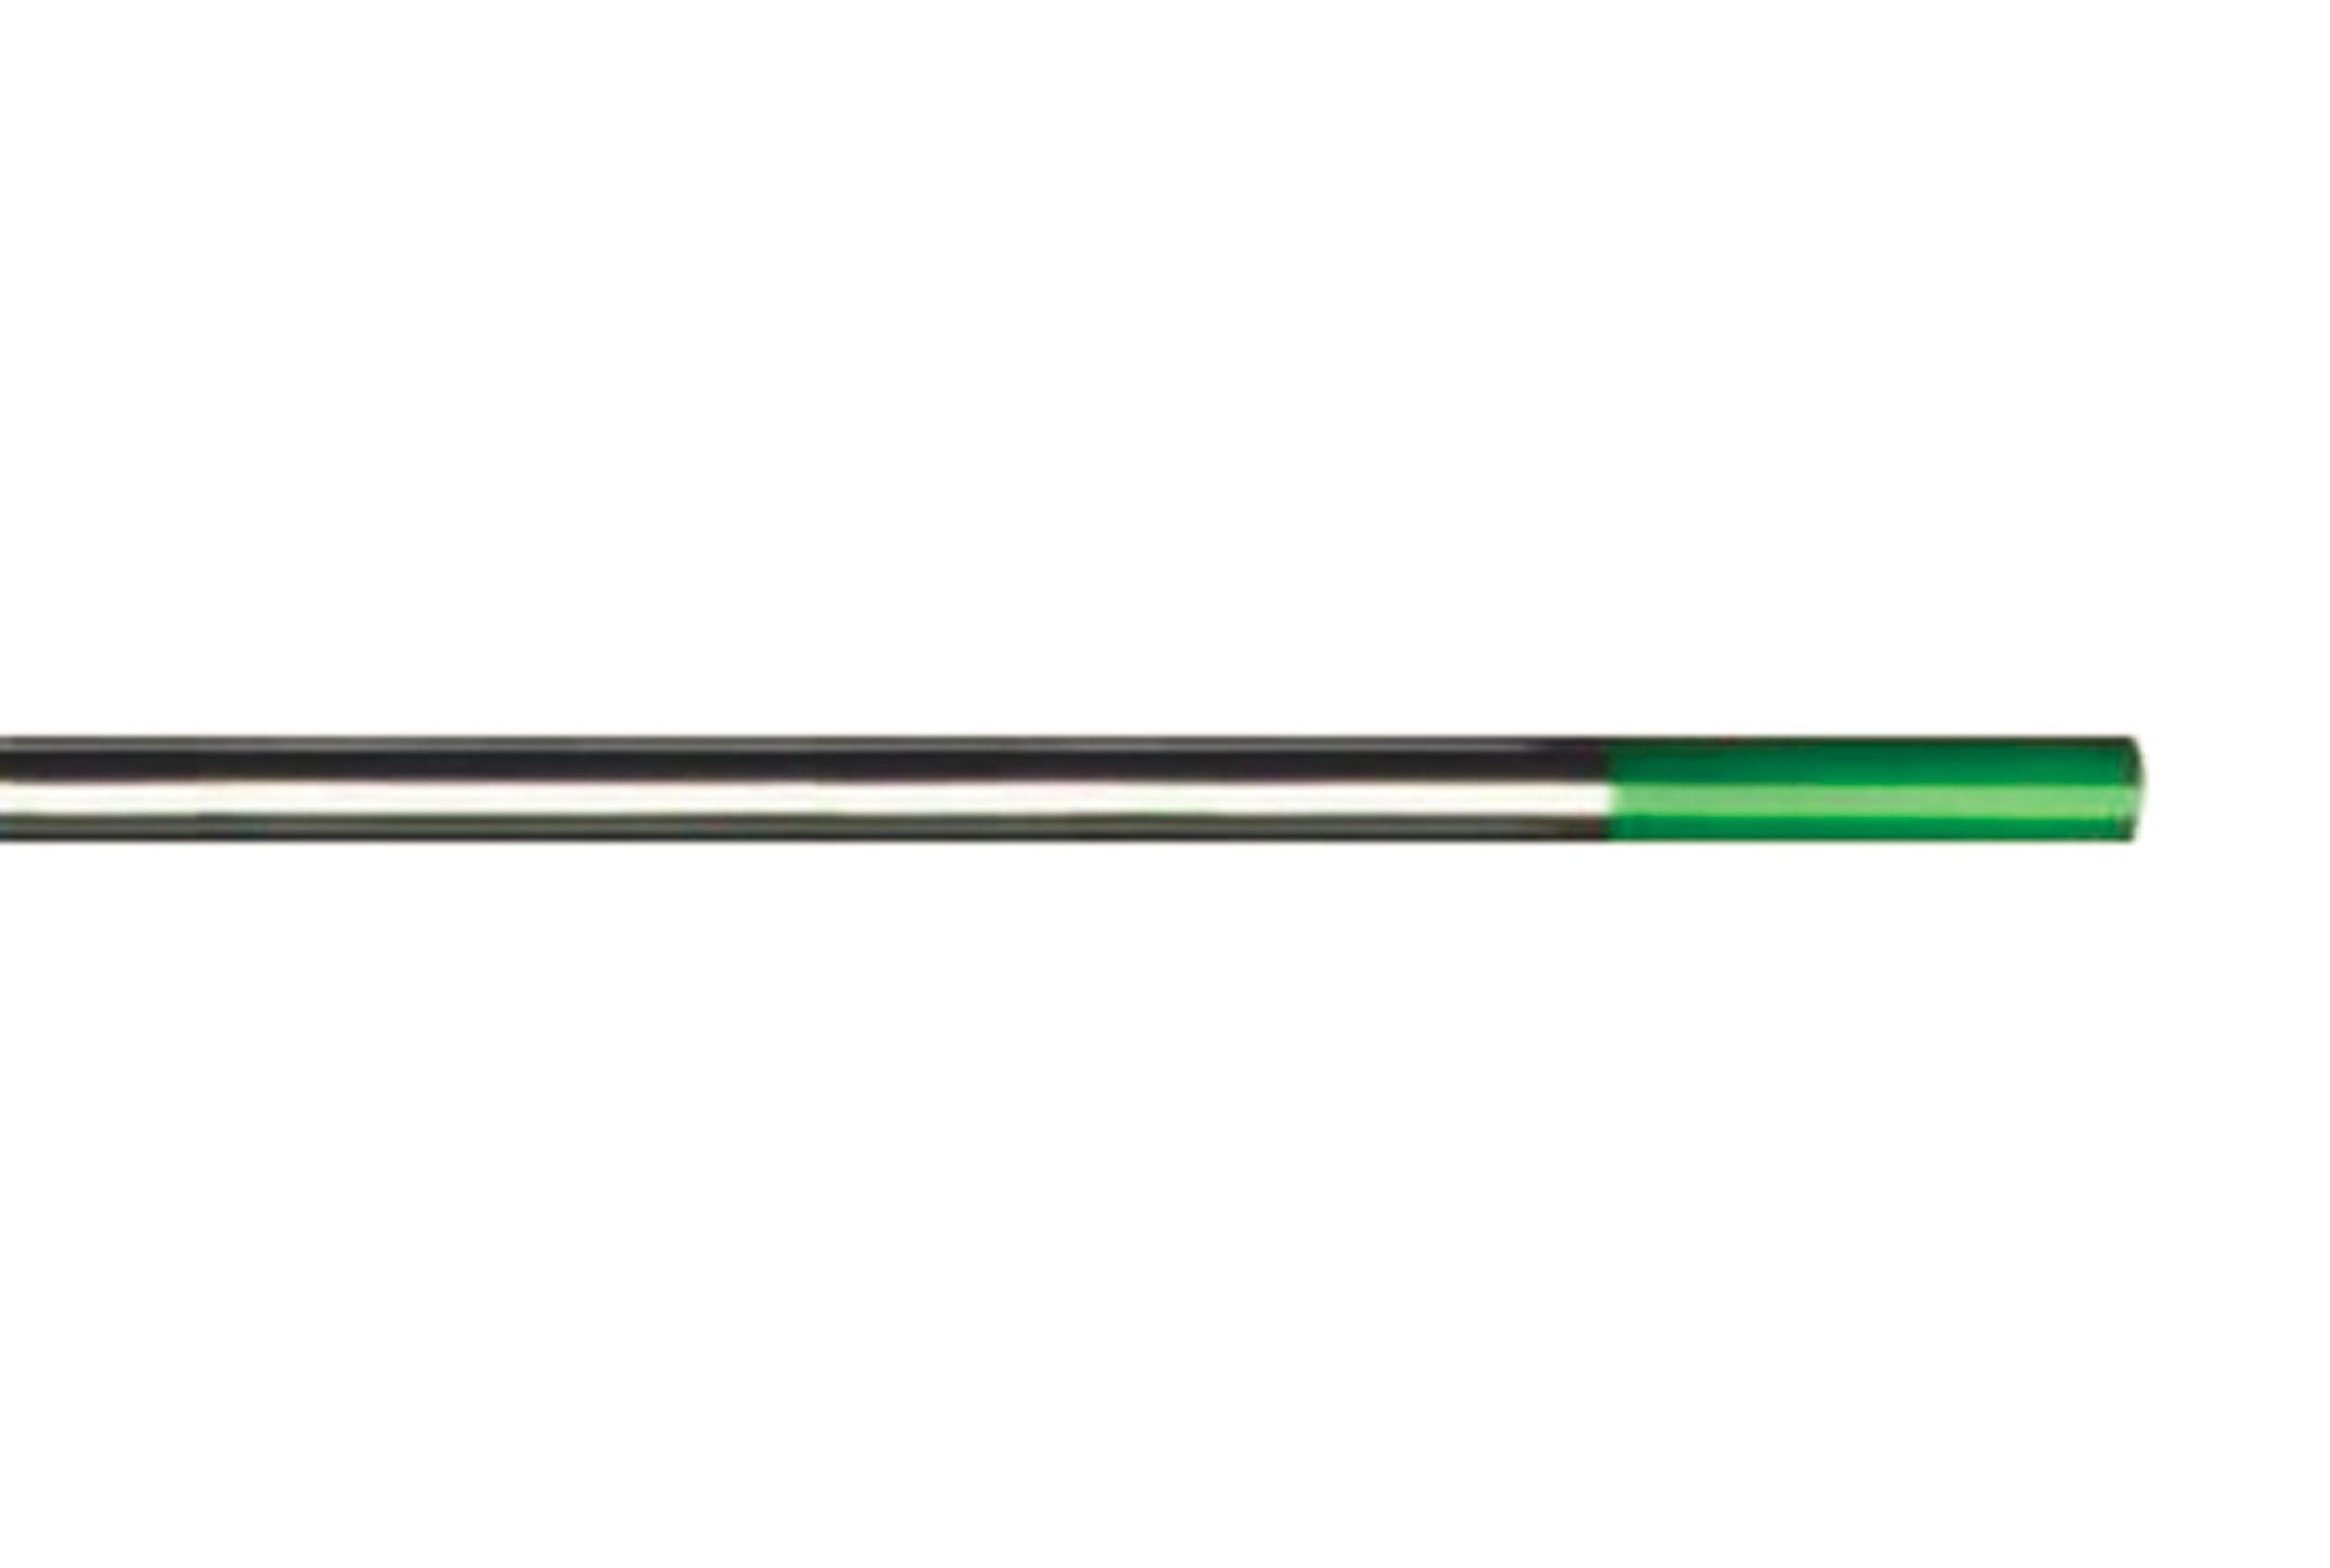 Электроды для сварки Gce Wp (400p040175sb) колонка юнкерс wp 275 bar